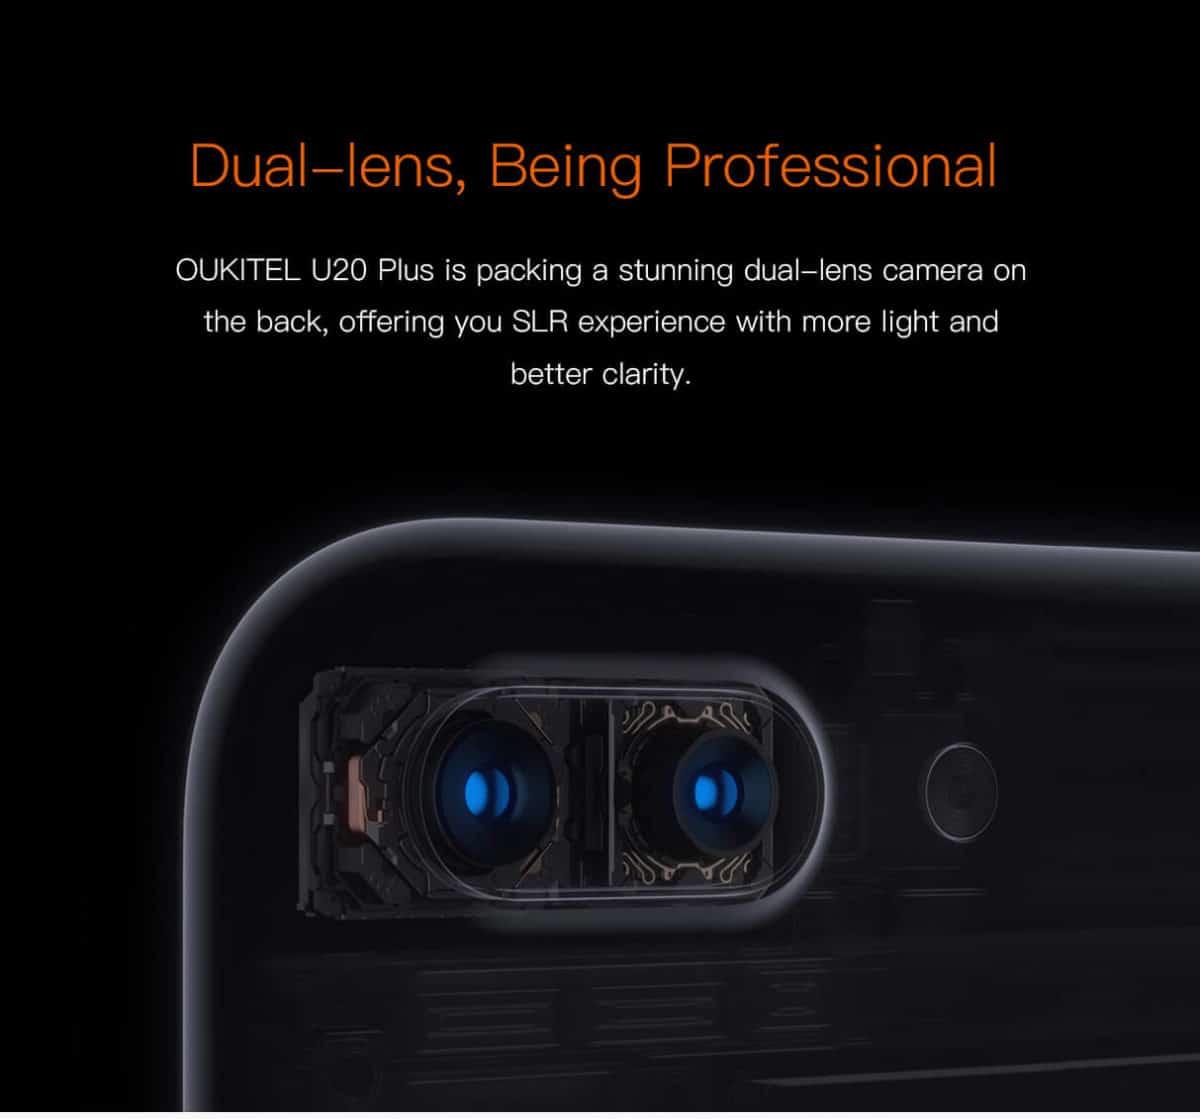 u20-plus-dual-back-cameras